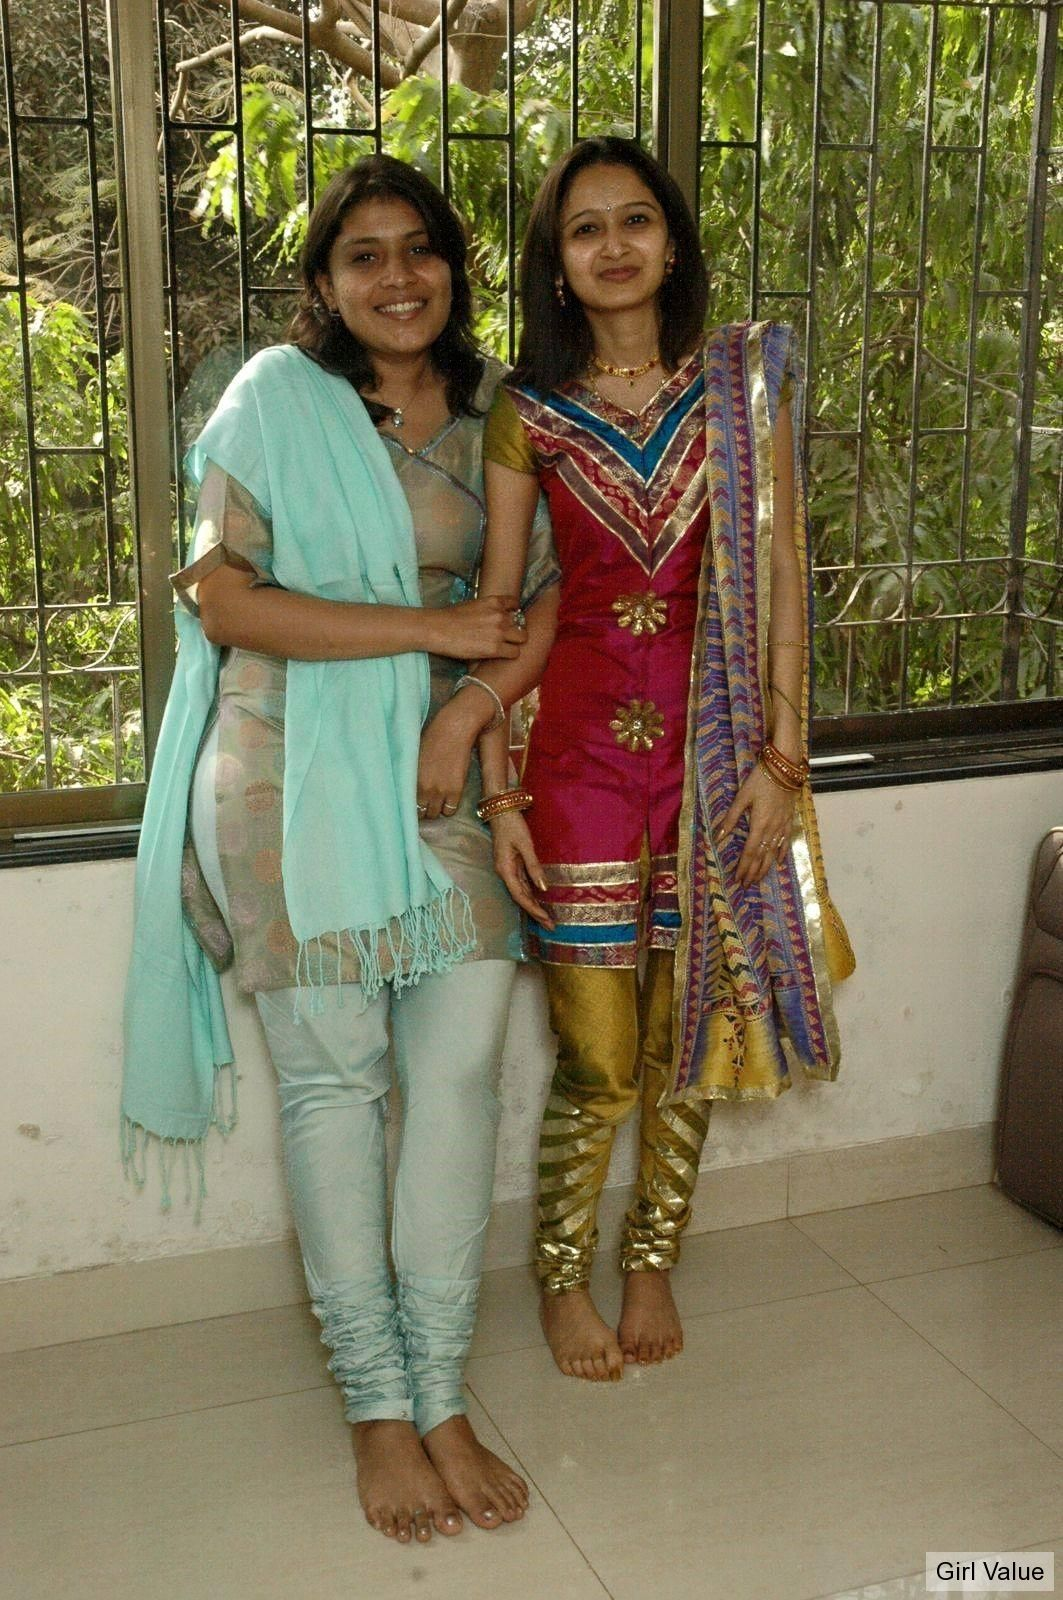 Hot Indian Girls In Leggings Salwar Kameez